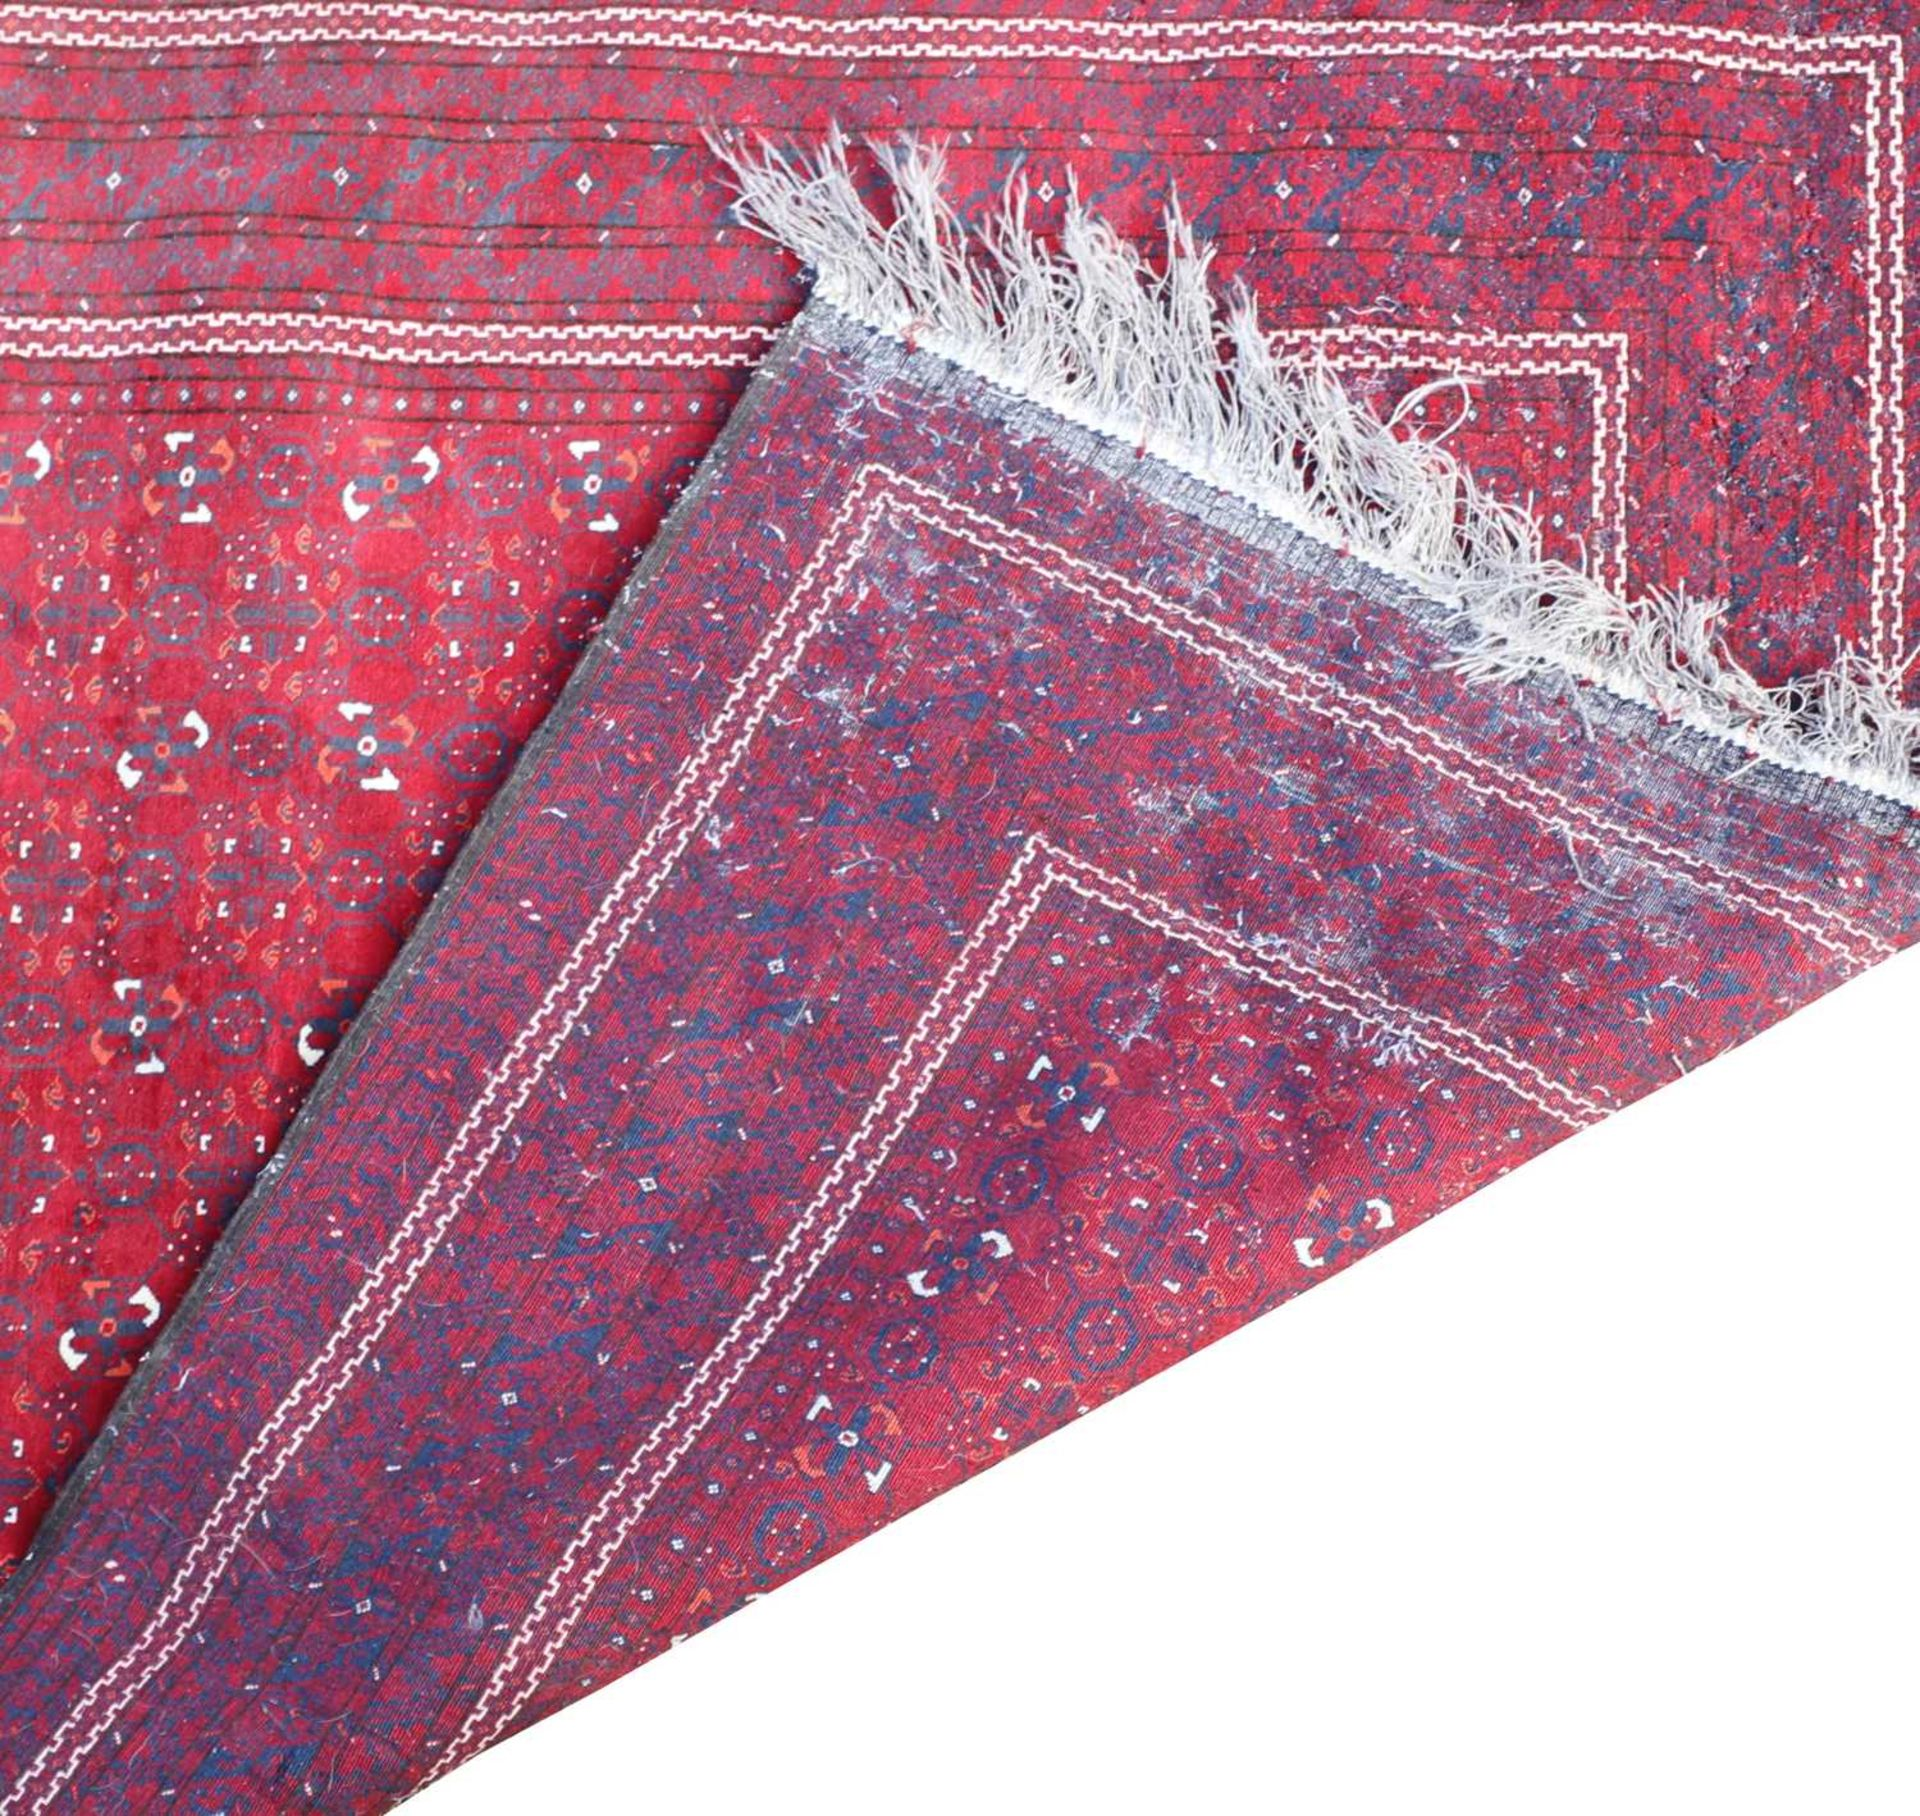 An Afghan Beshir rug, - Image 3 of 17